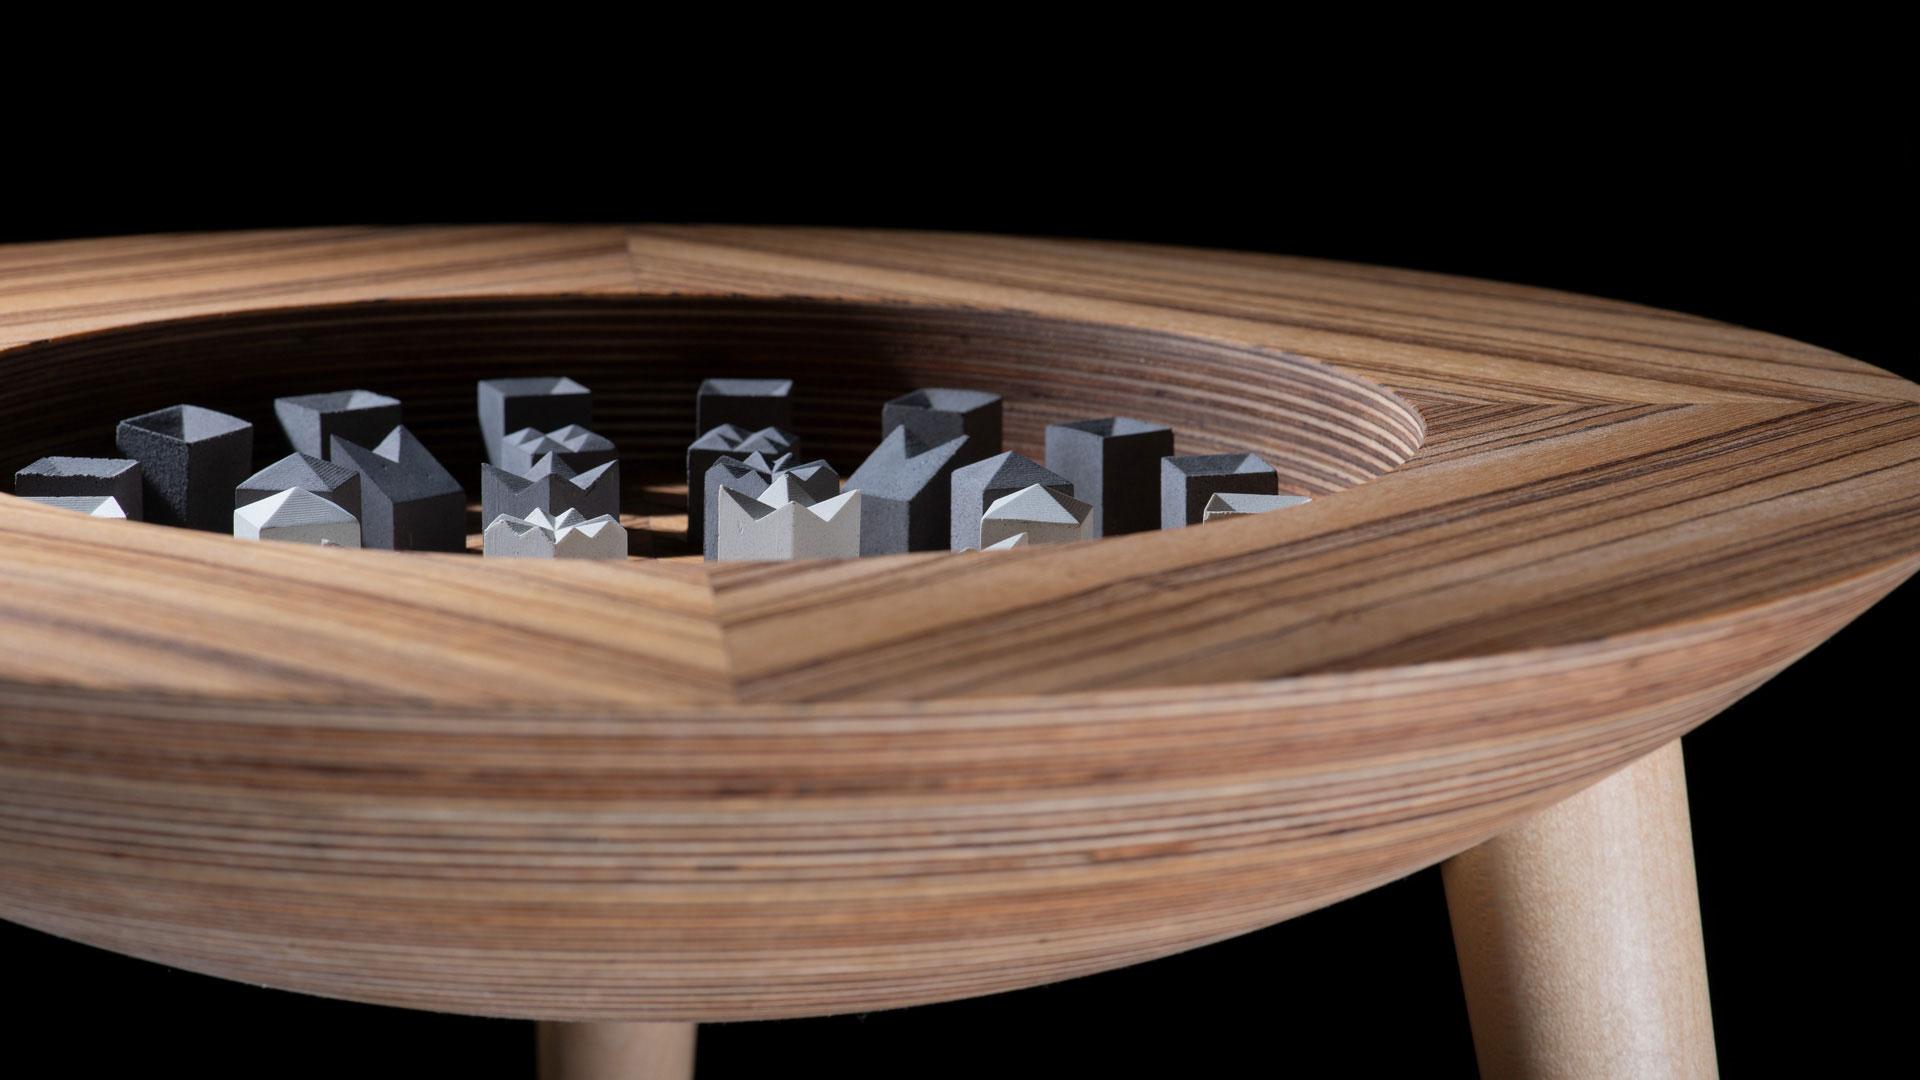 08-trojan-galerie-futuro-studio